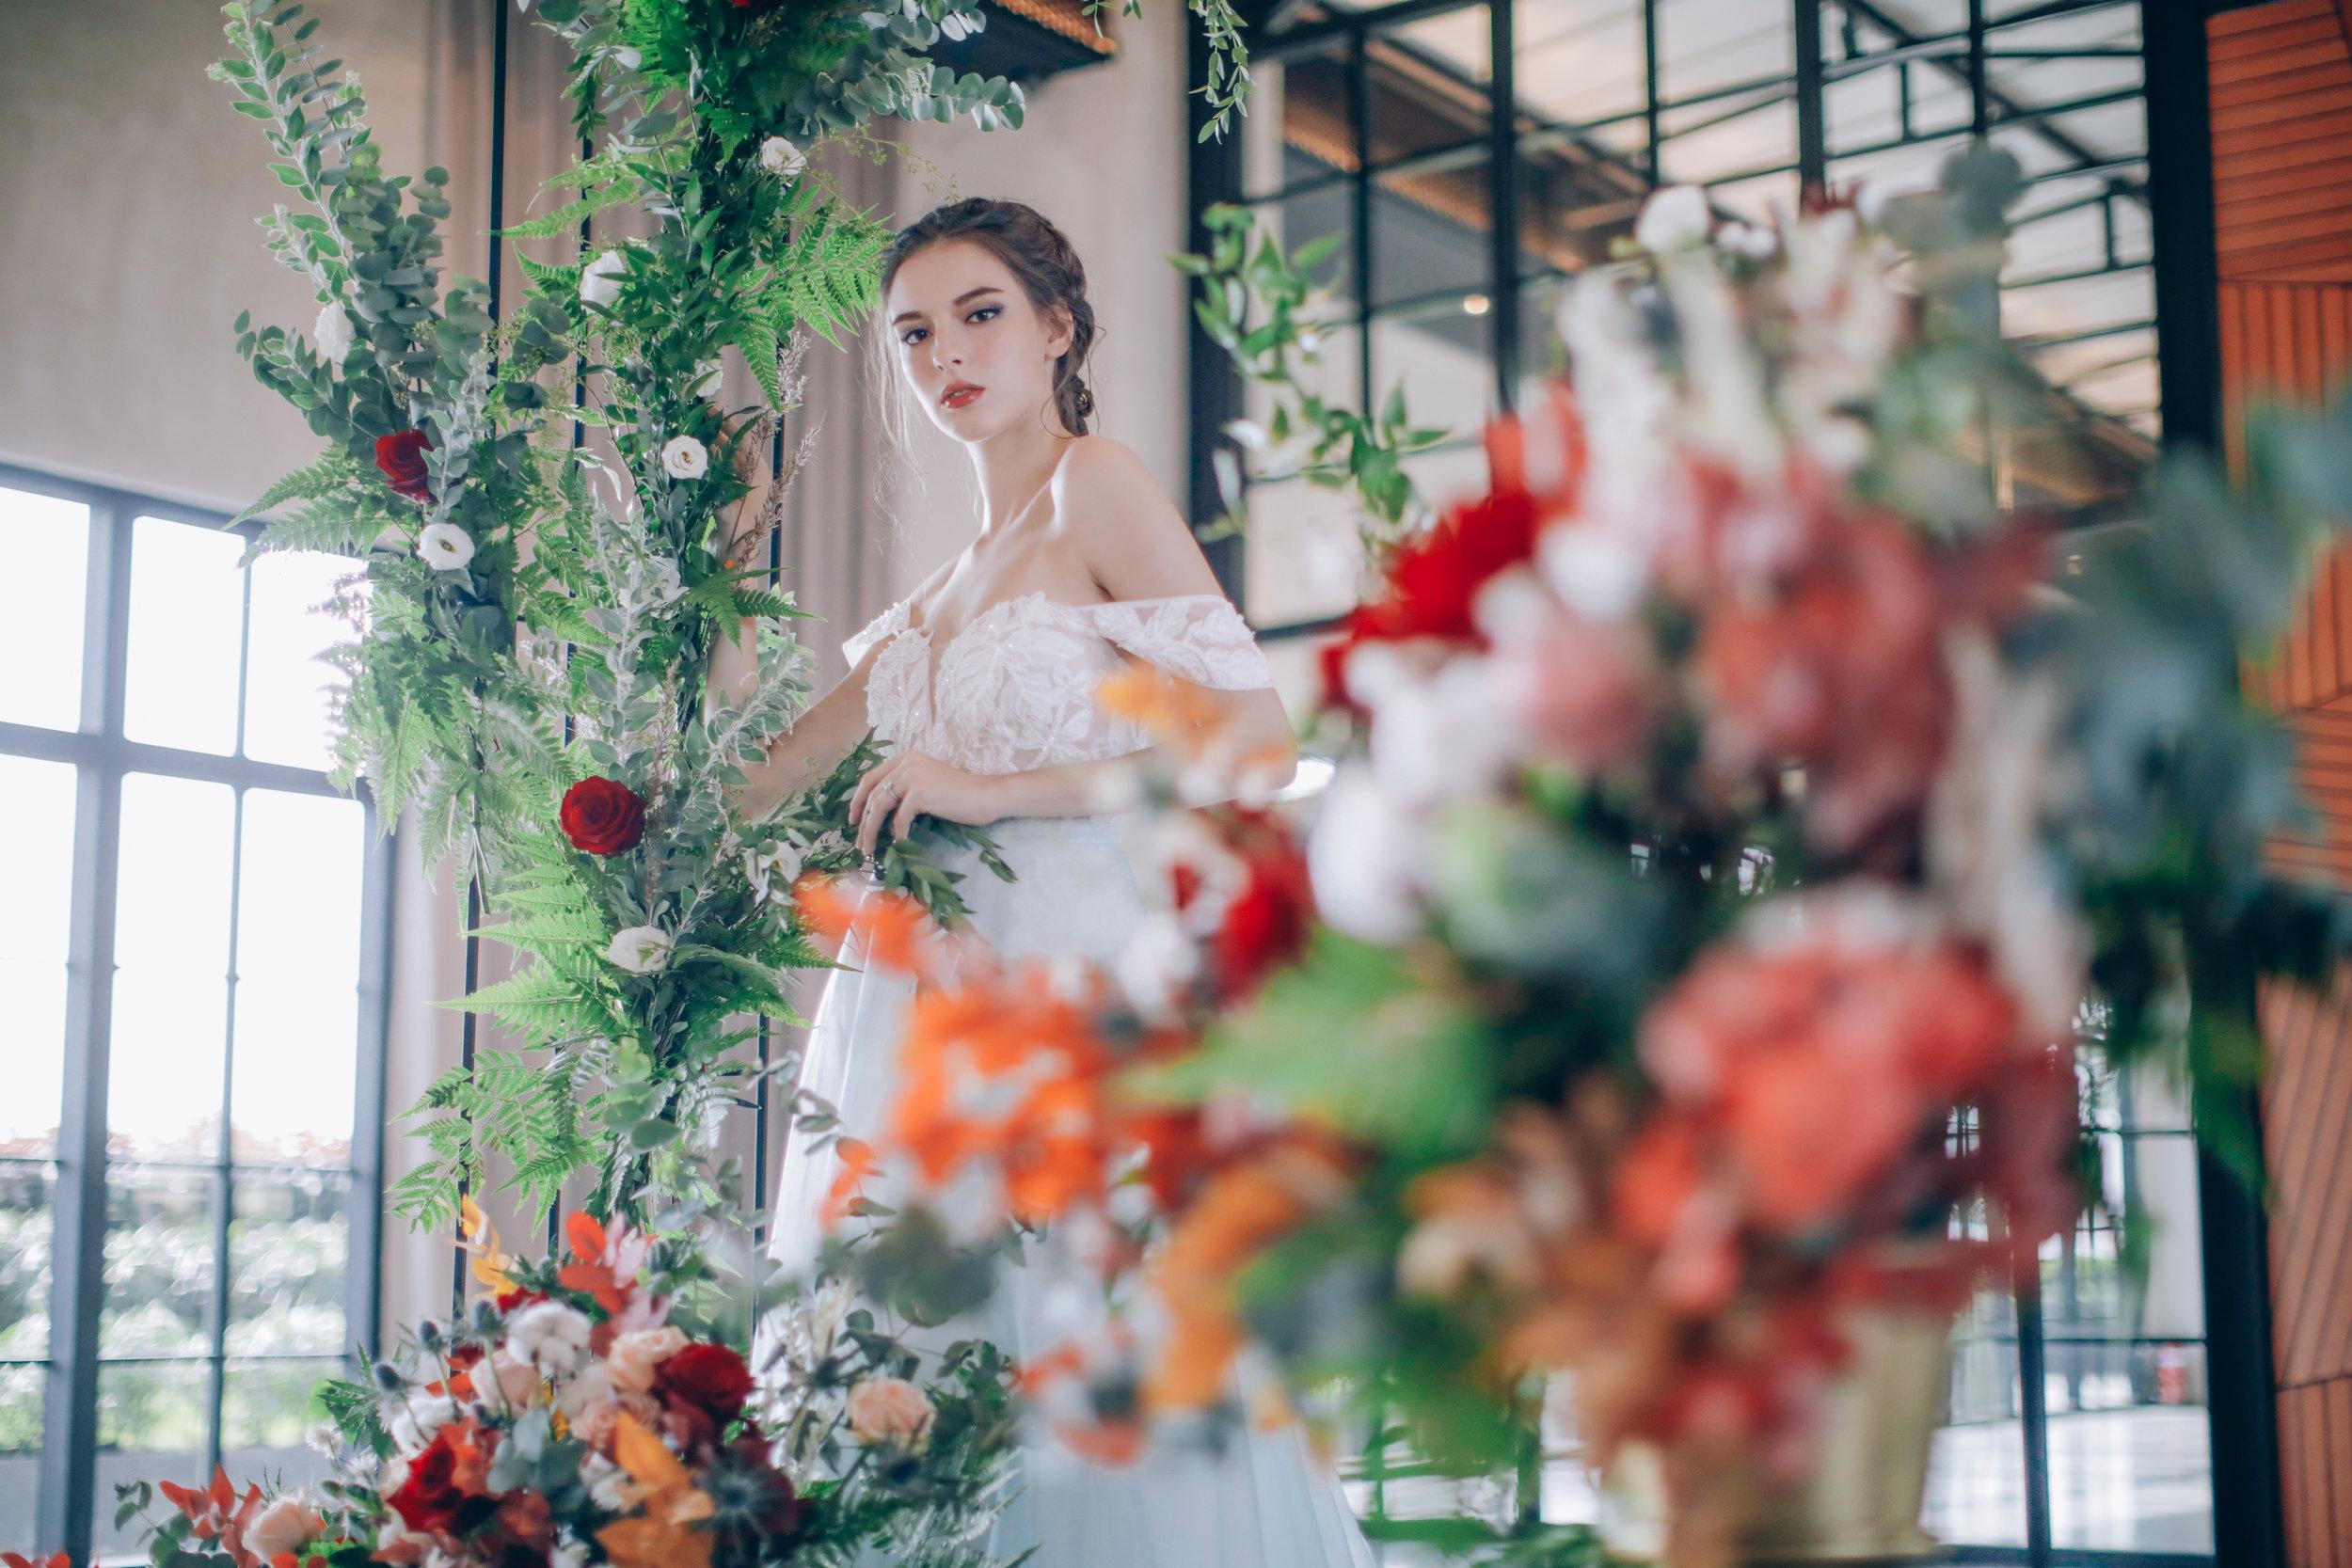 201809_Style Shoot Annabelle_80.jpg